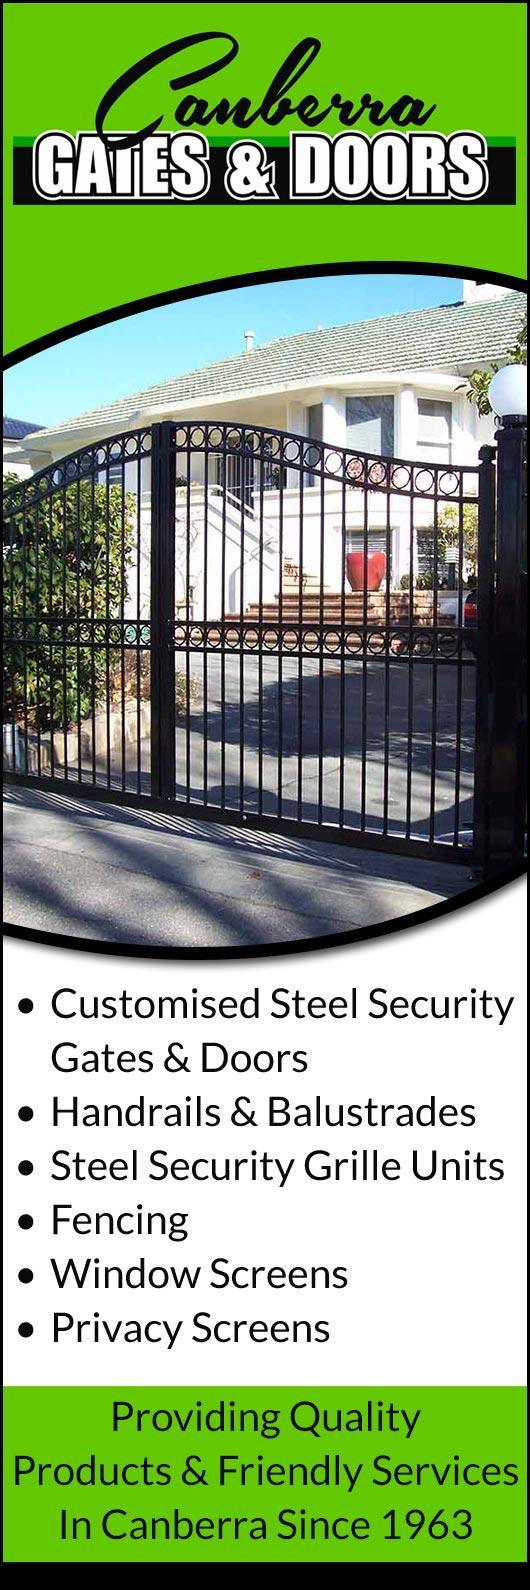 Canberra Gates \u0026 Doors - Promotion & Canberra Gates \u0026 Doors - Gates - 17 Stephens Rd - Queanbeyan